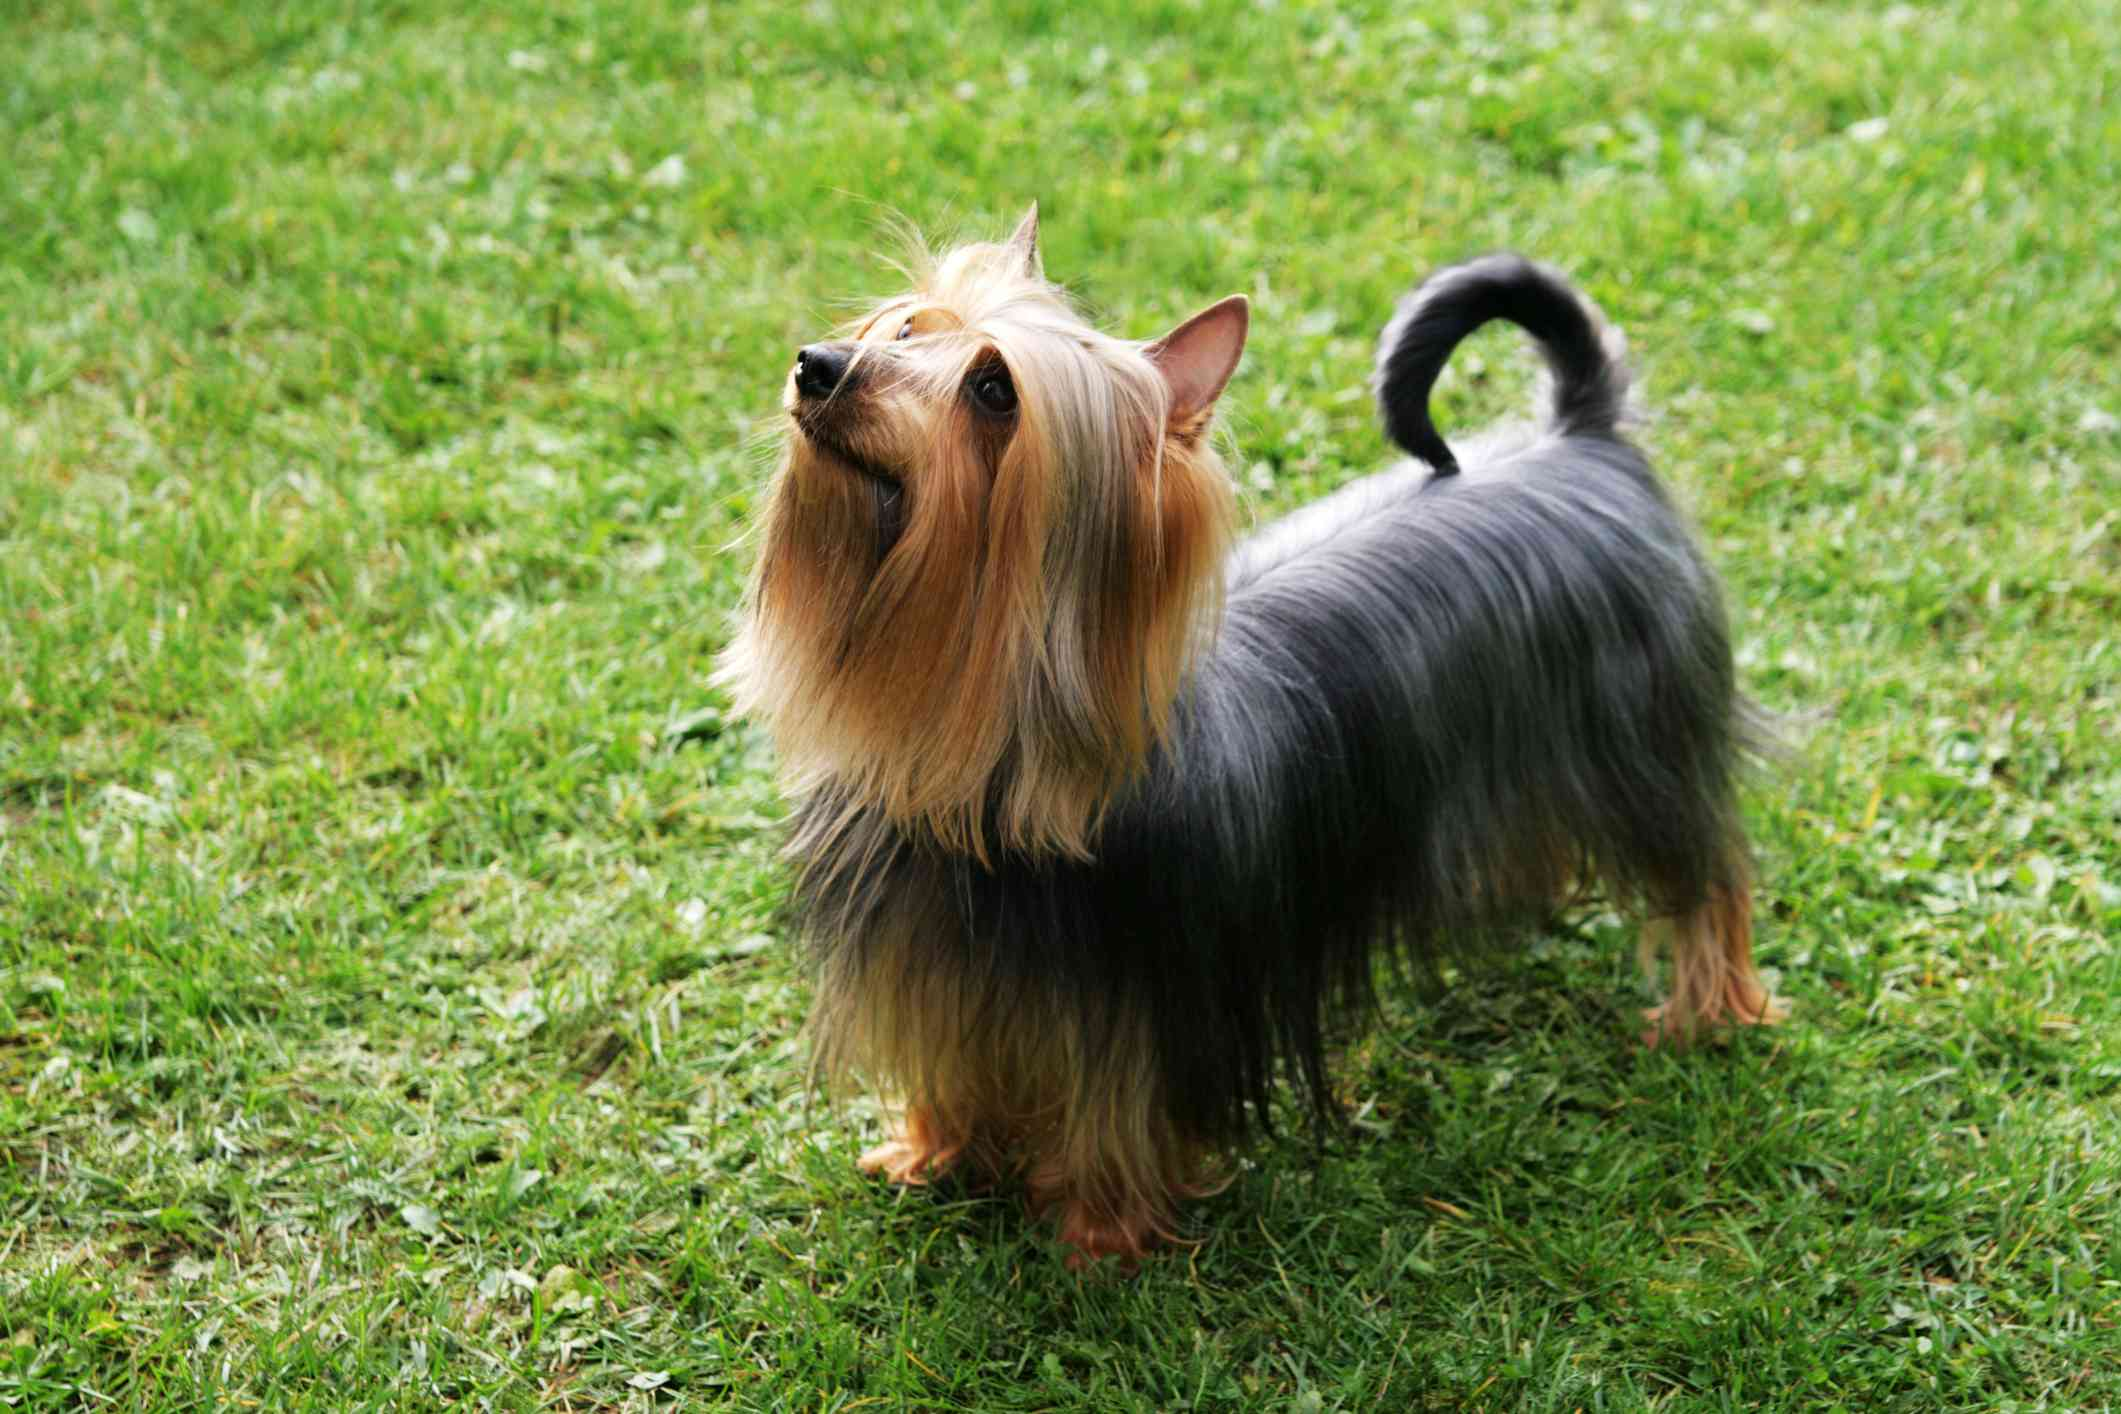 Silky Terrier dog outside in grass.